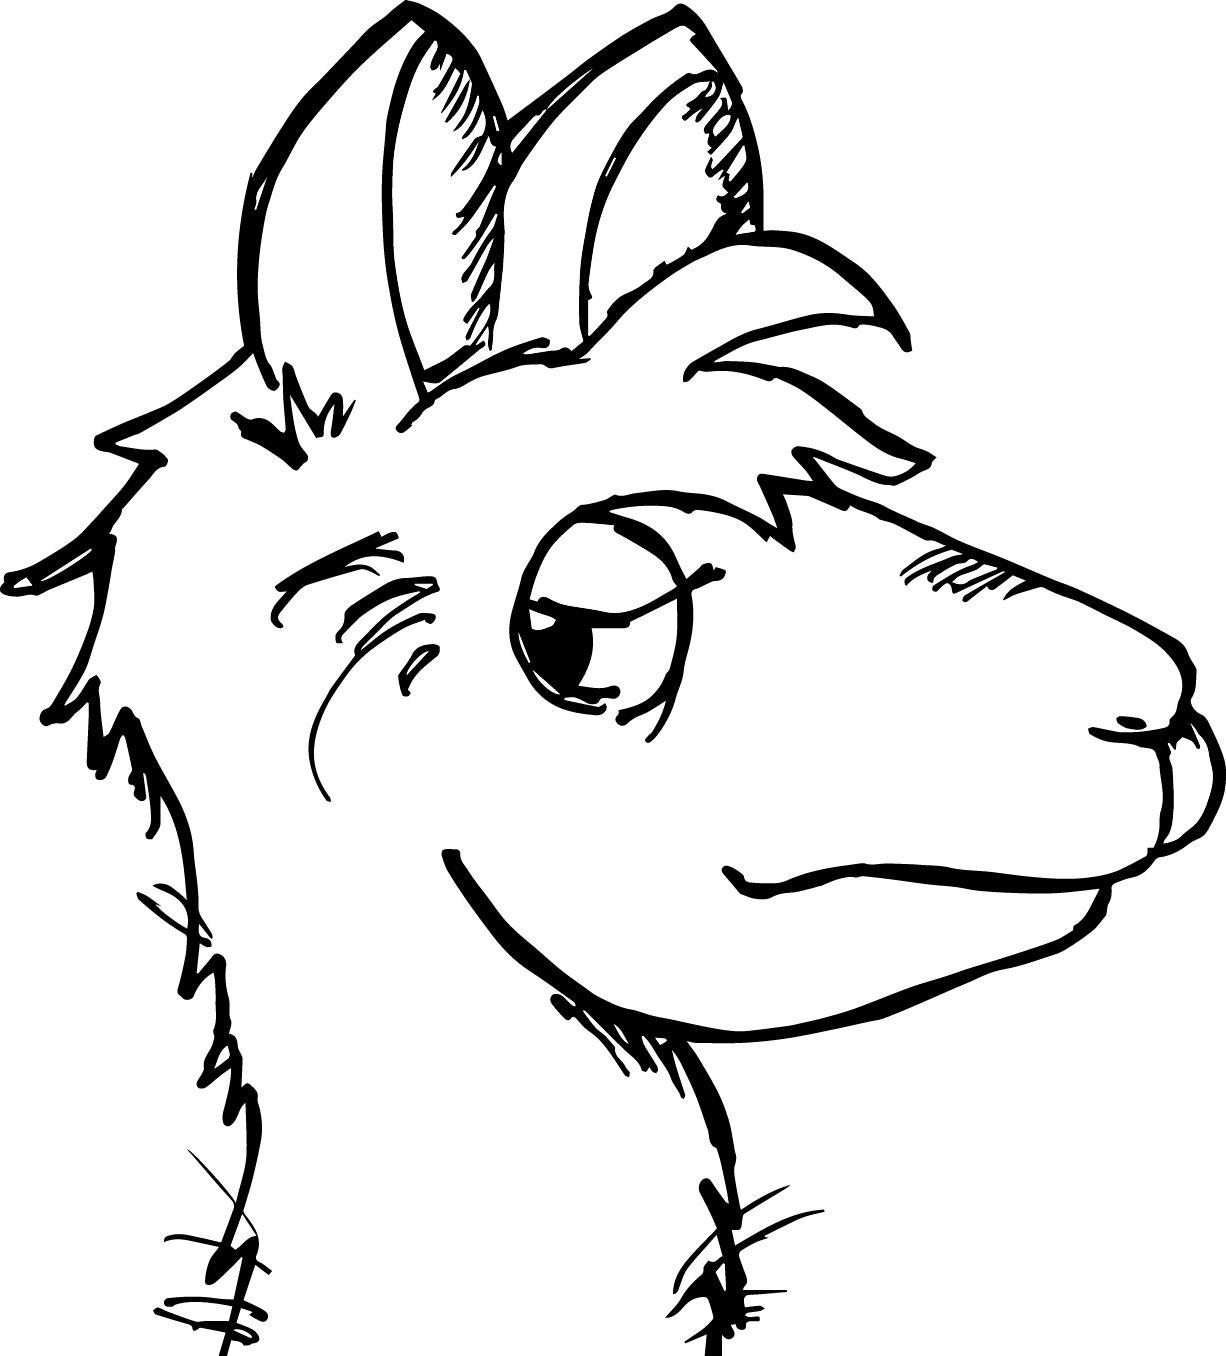 Llamas Love Lettering Worksheets